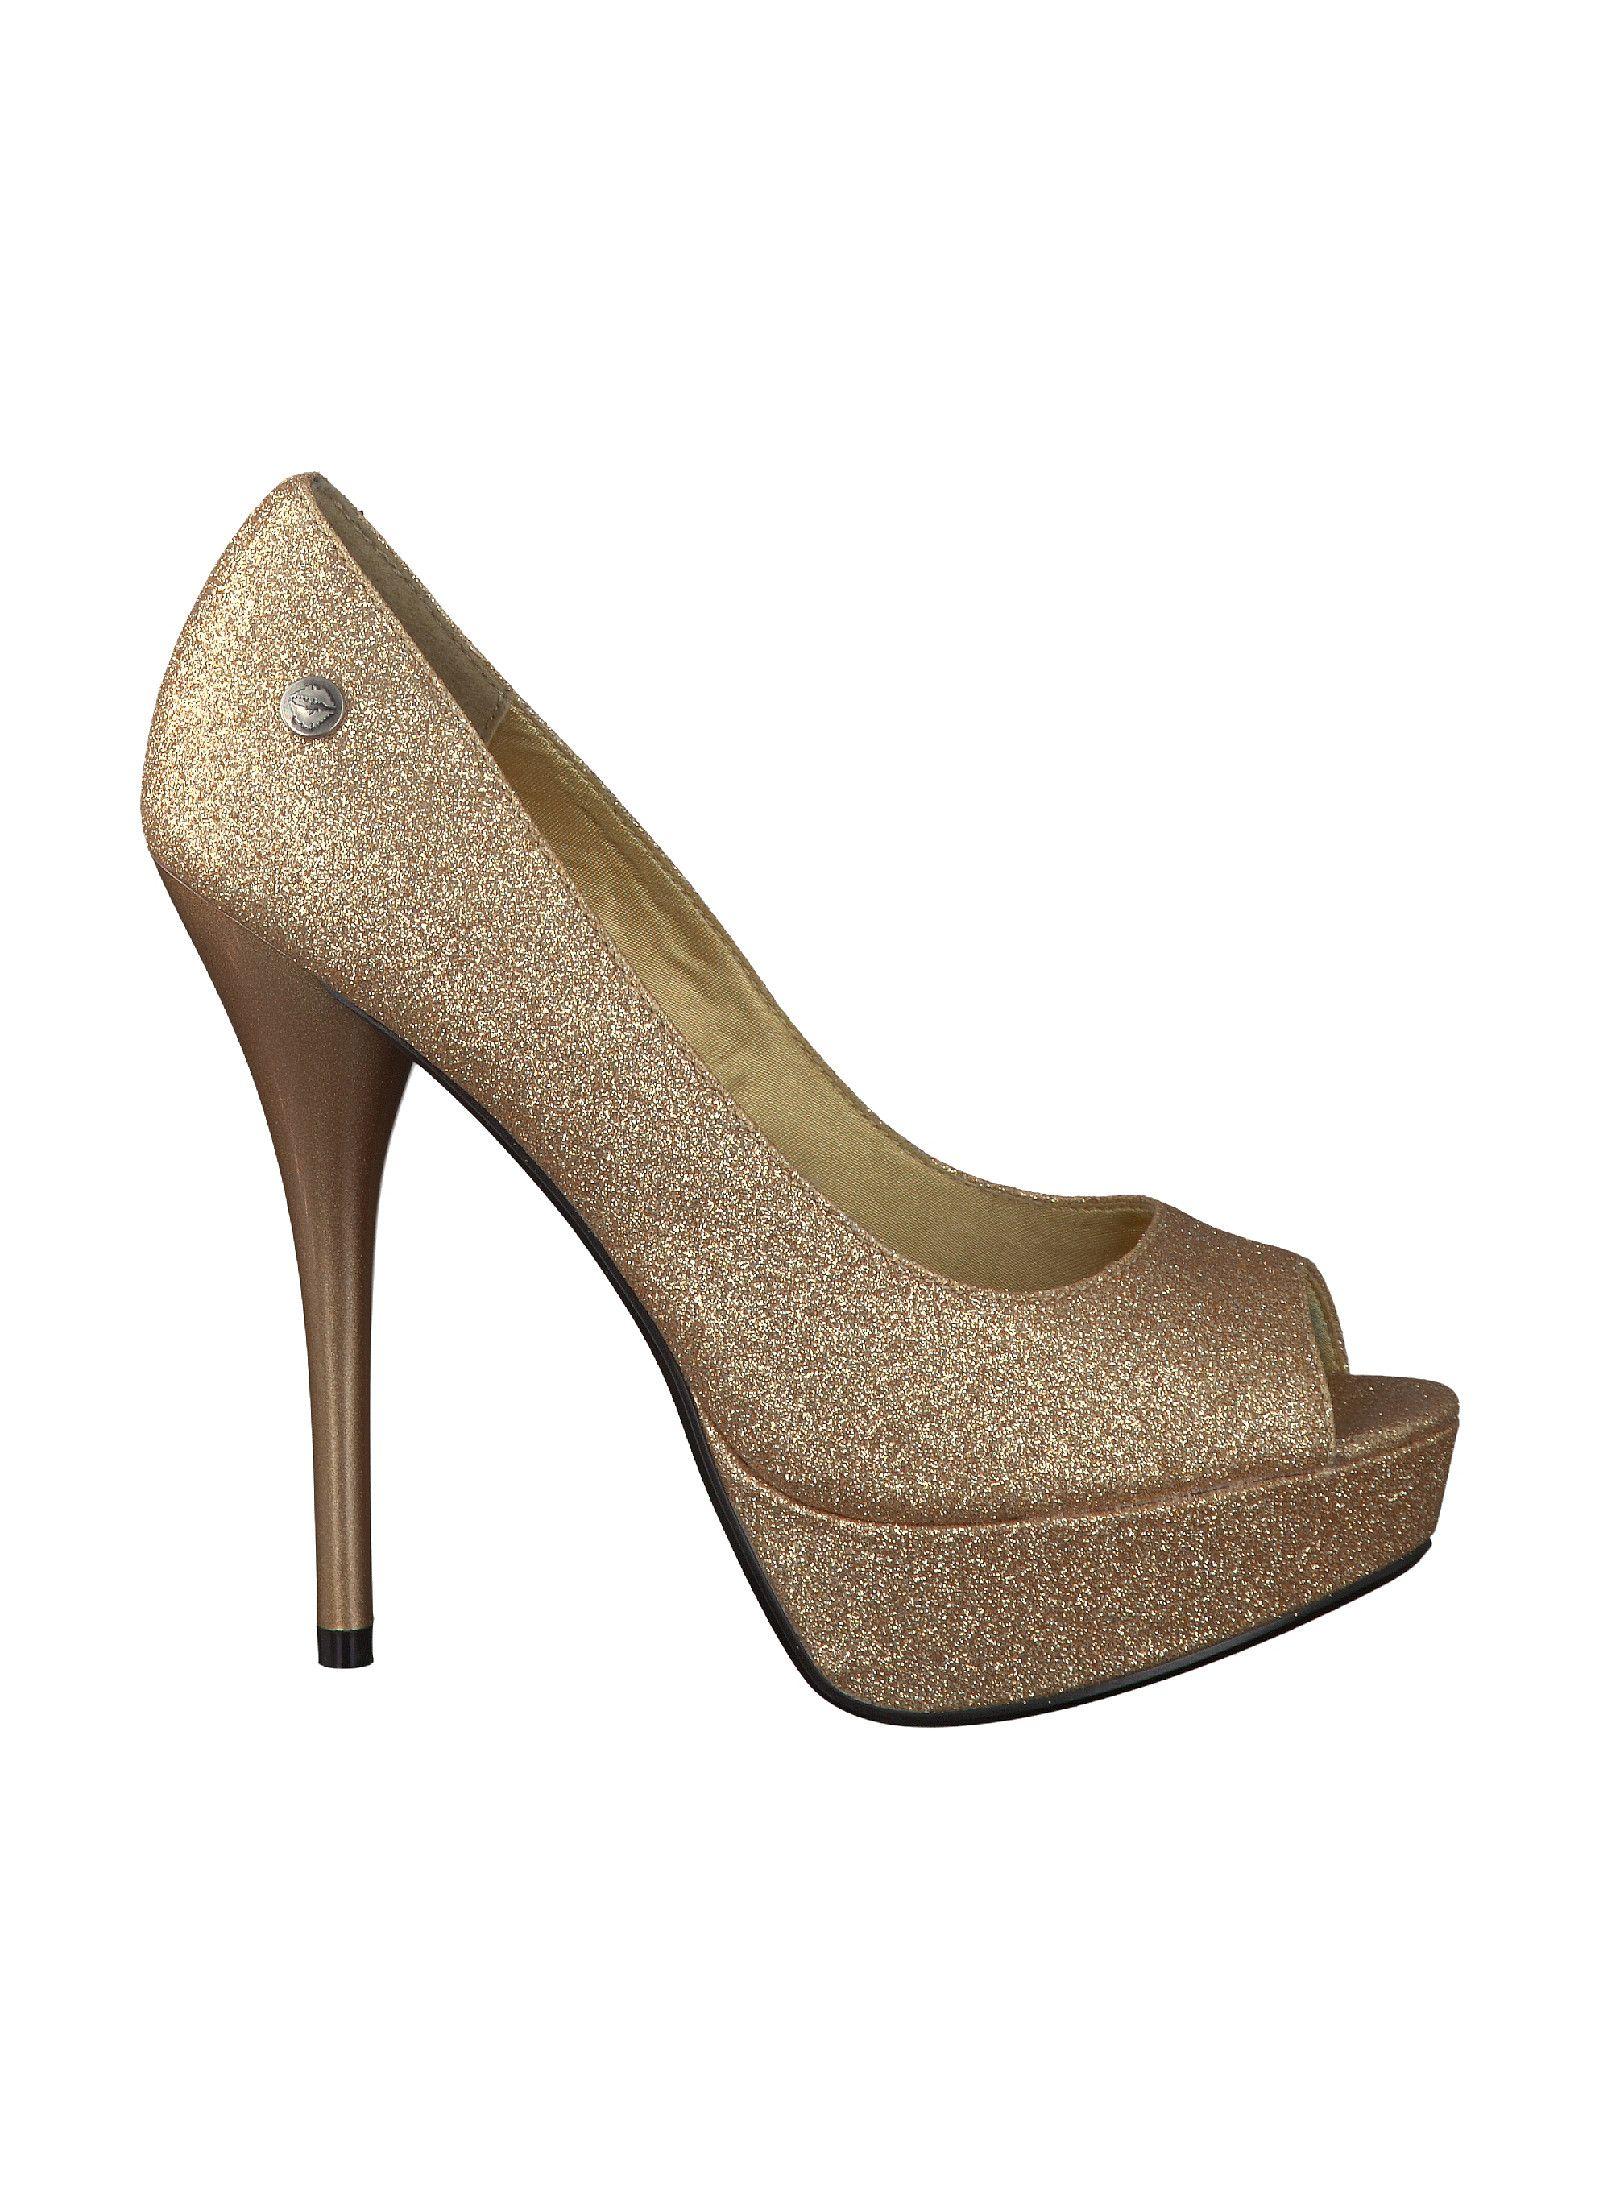 a162a3169975 Reno - Melrose - Pumps, Gold - Pumps - Damen - Schuhe - Reno Online-Shop  für Marken-Schuhe